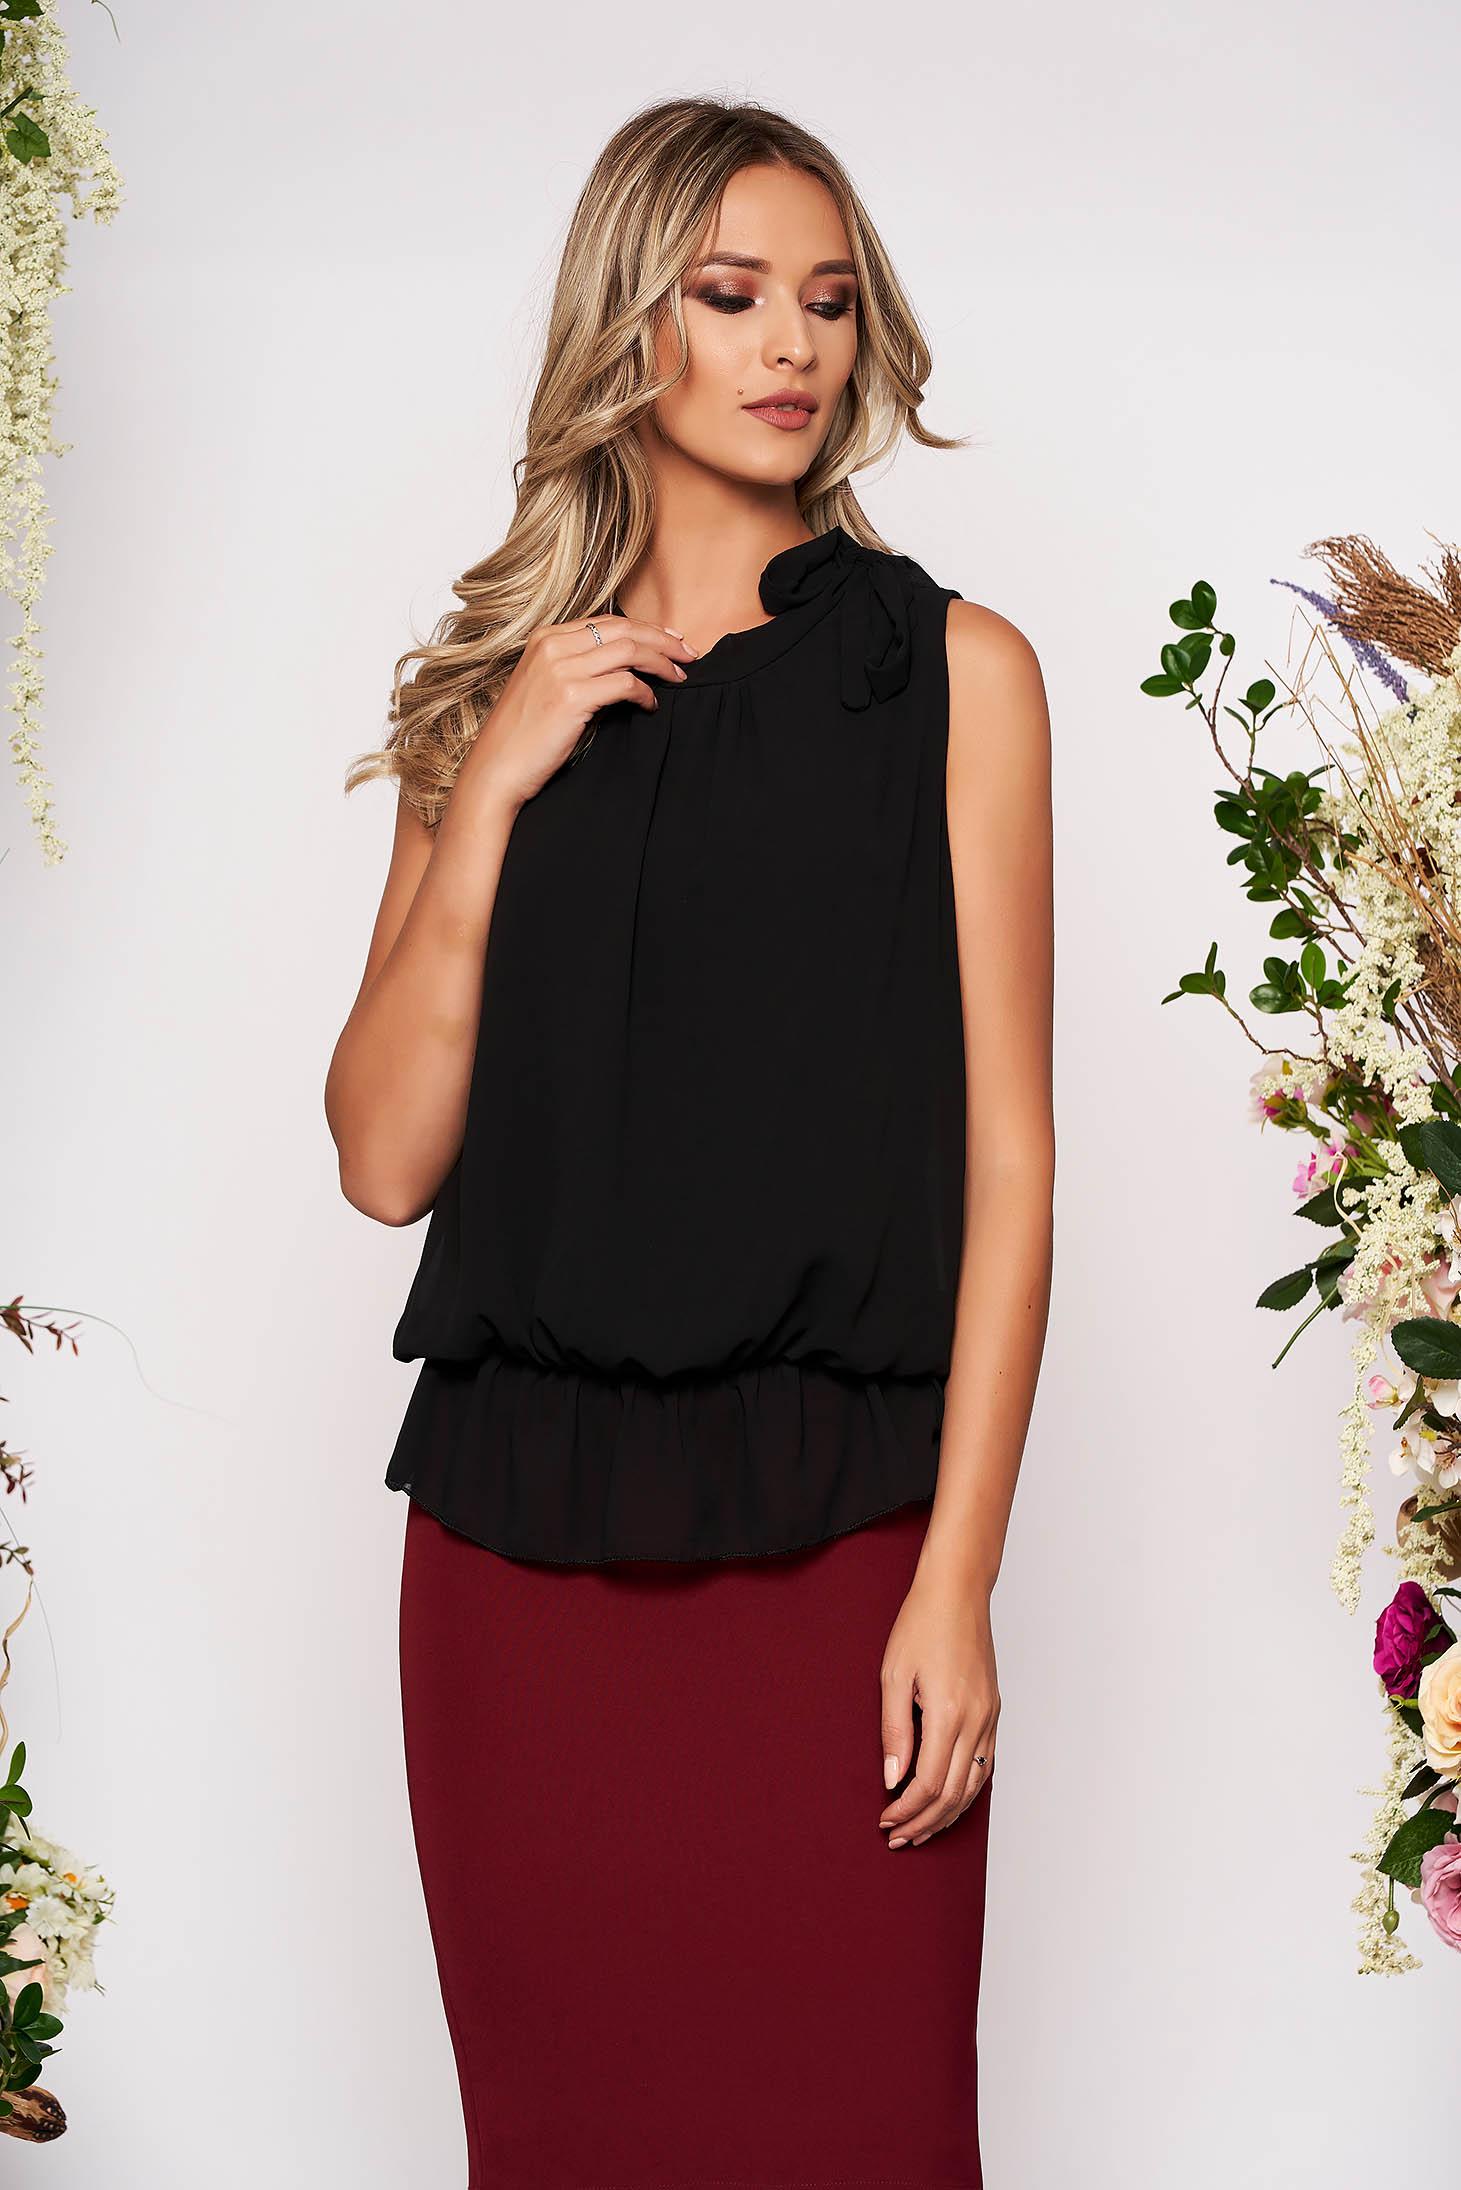 Black top shirt elegant from veil fabric with elastic waist sleeveless